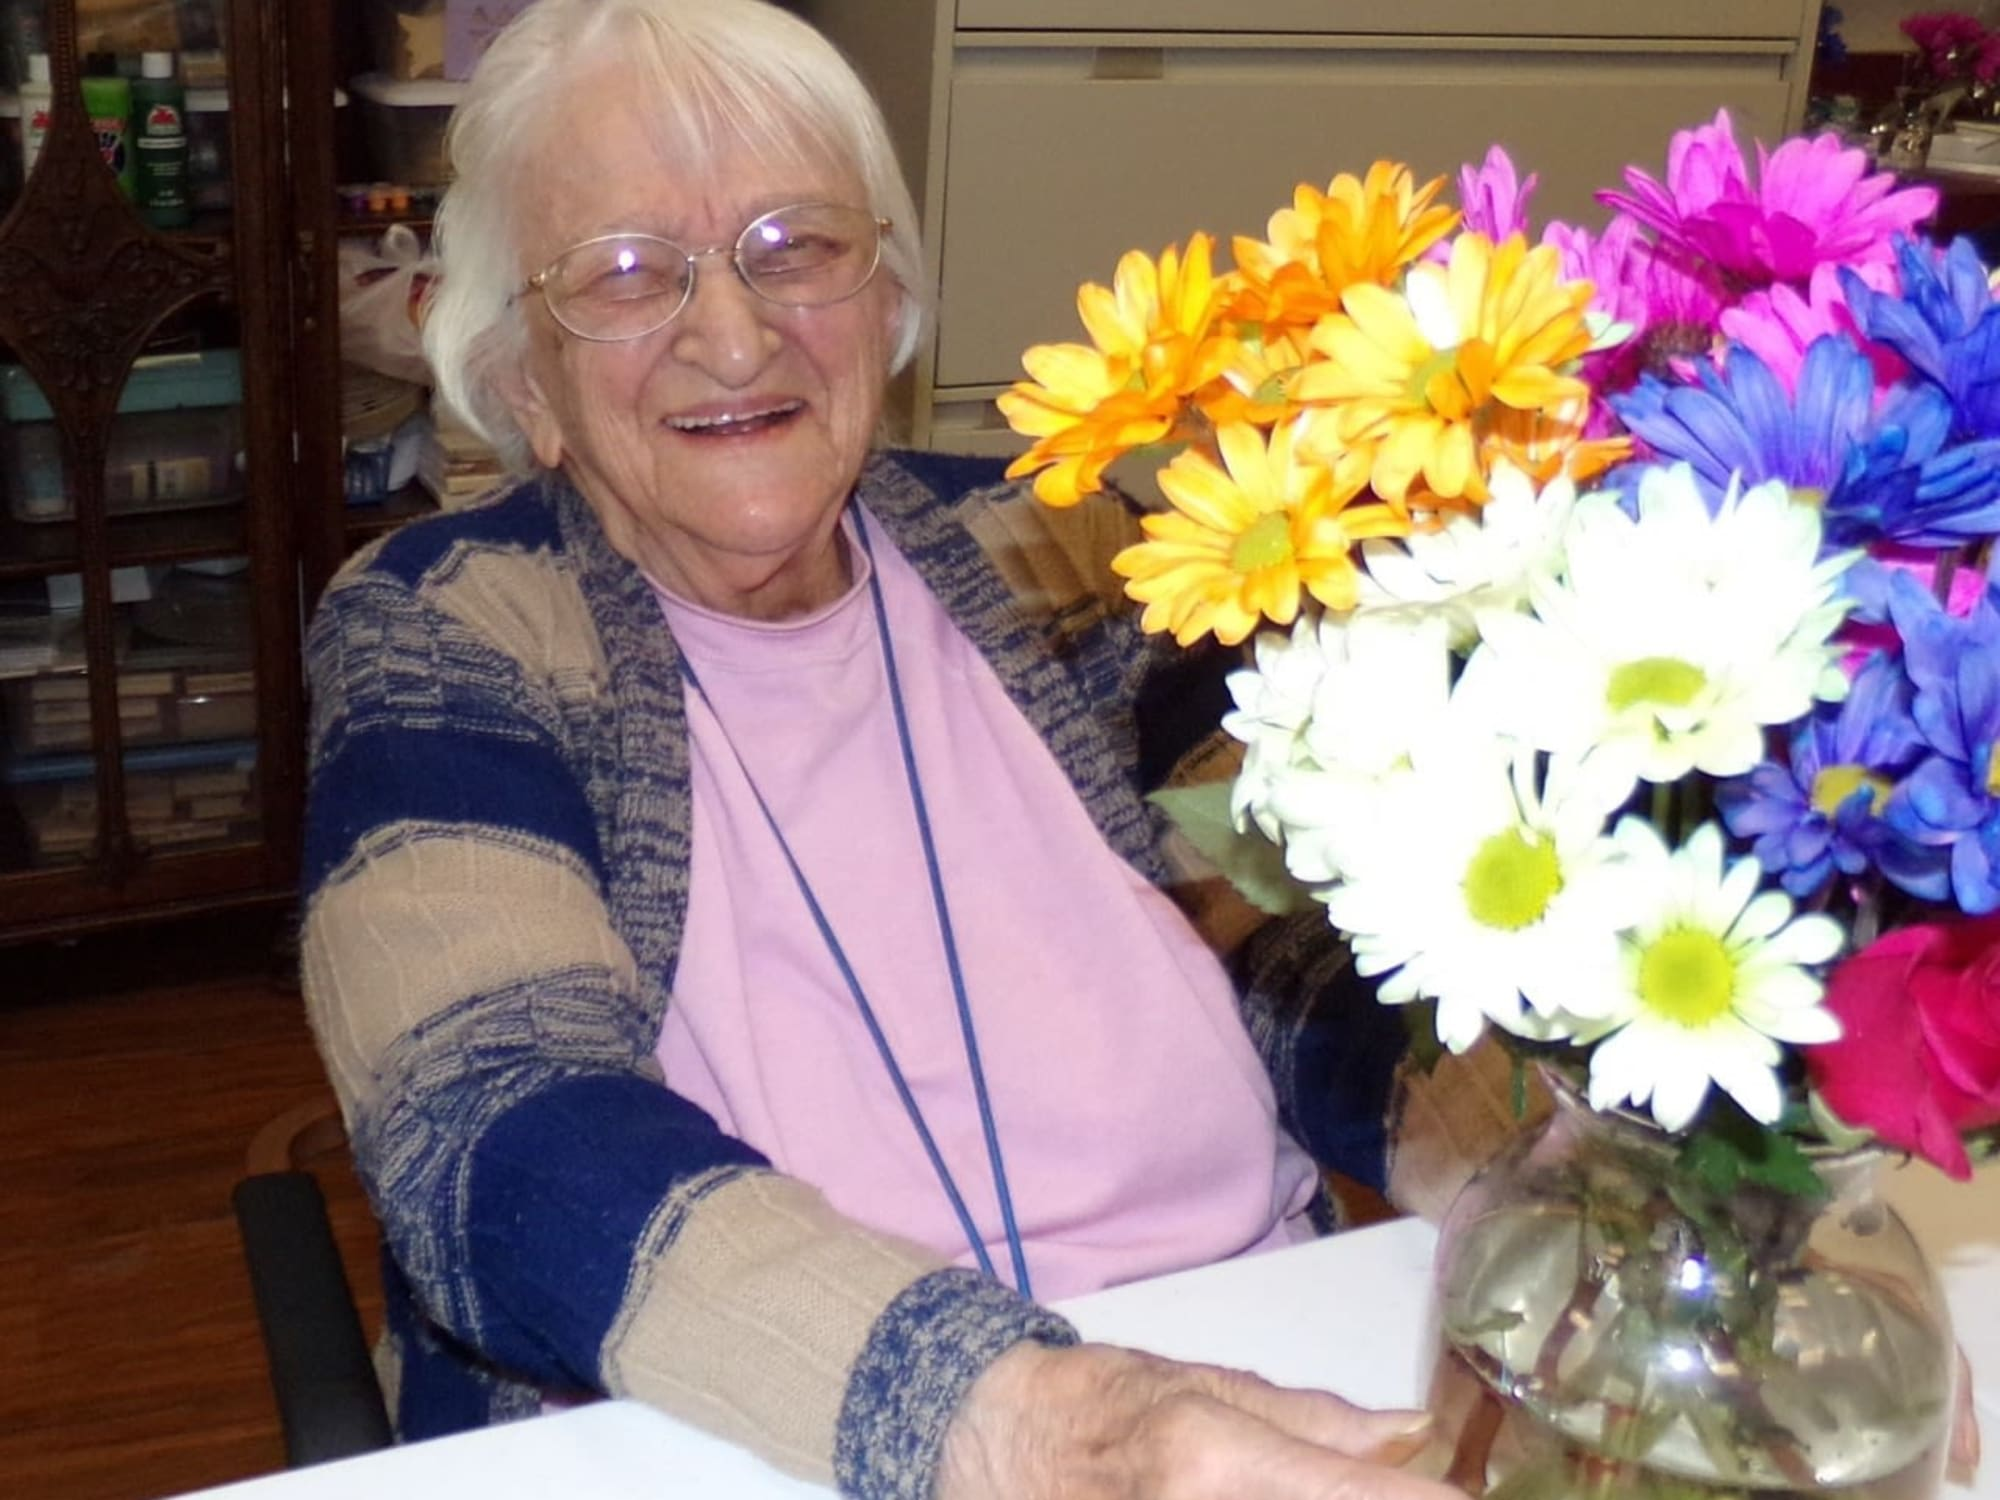 Vase of flowers at The Inn at Greenwood Village in Greenwood Village, Colorado